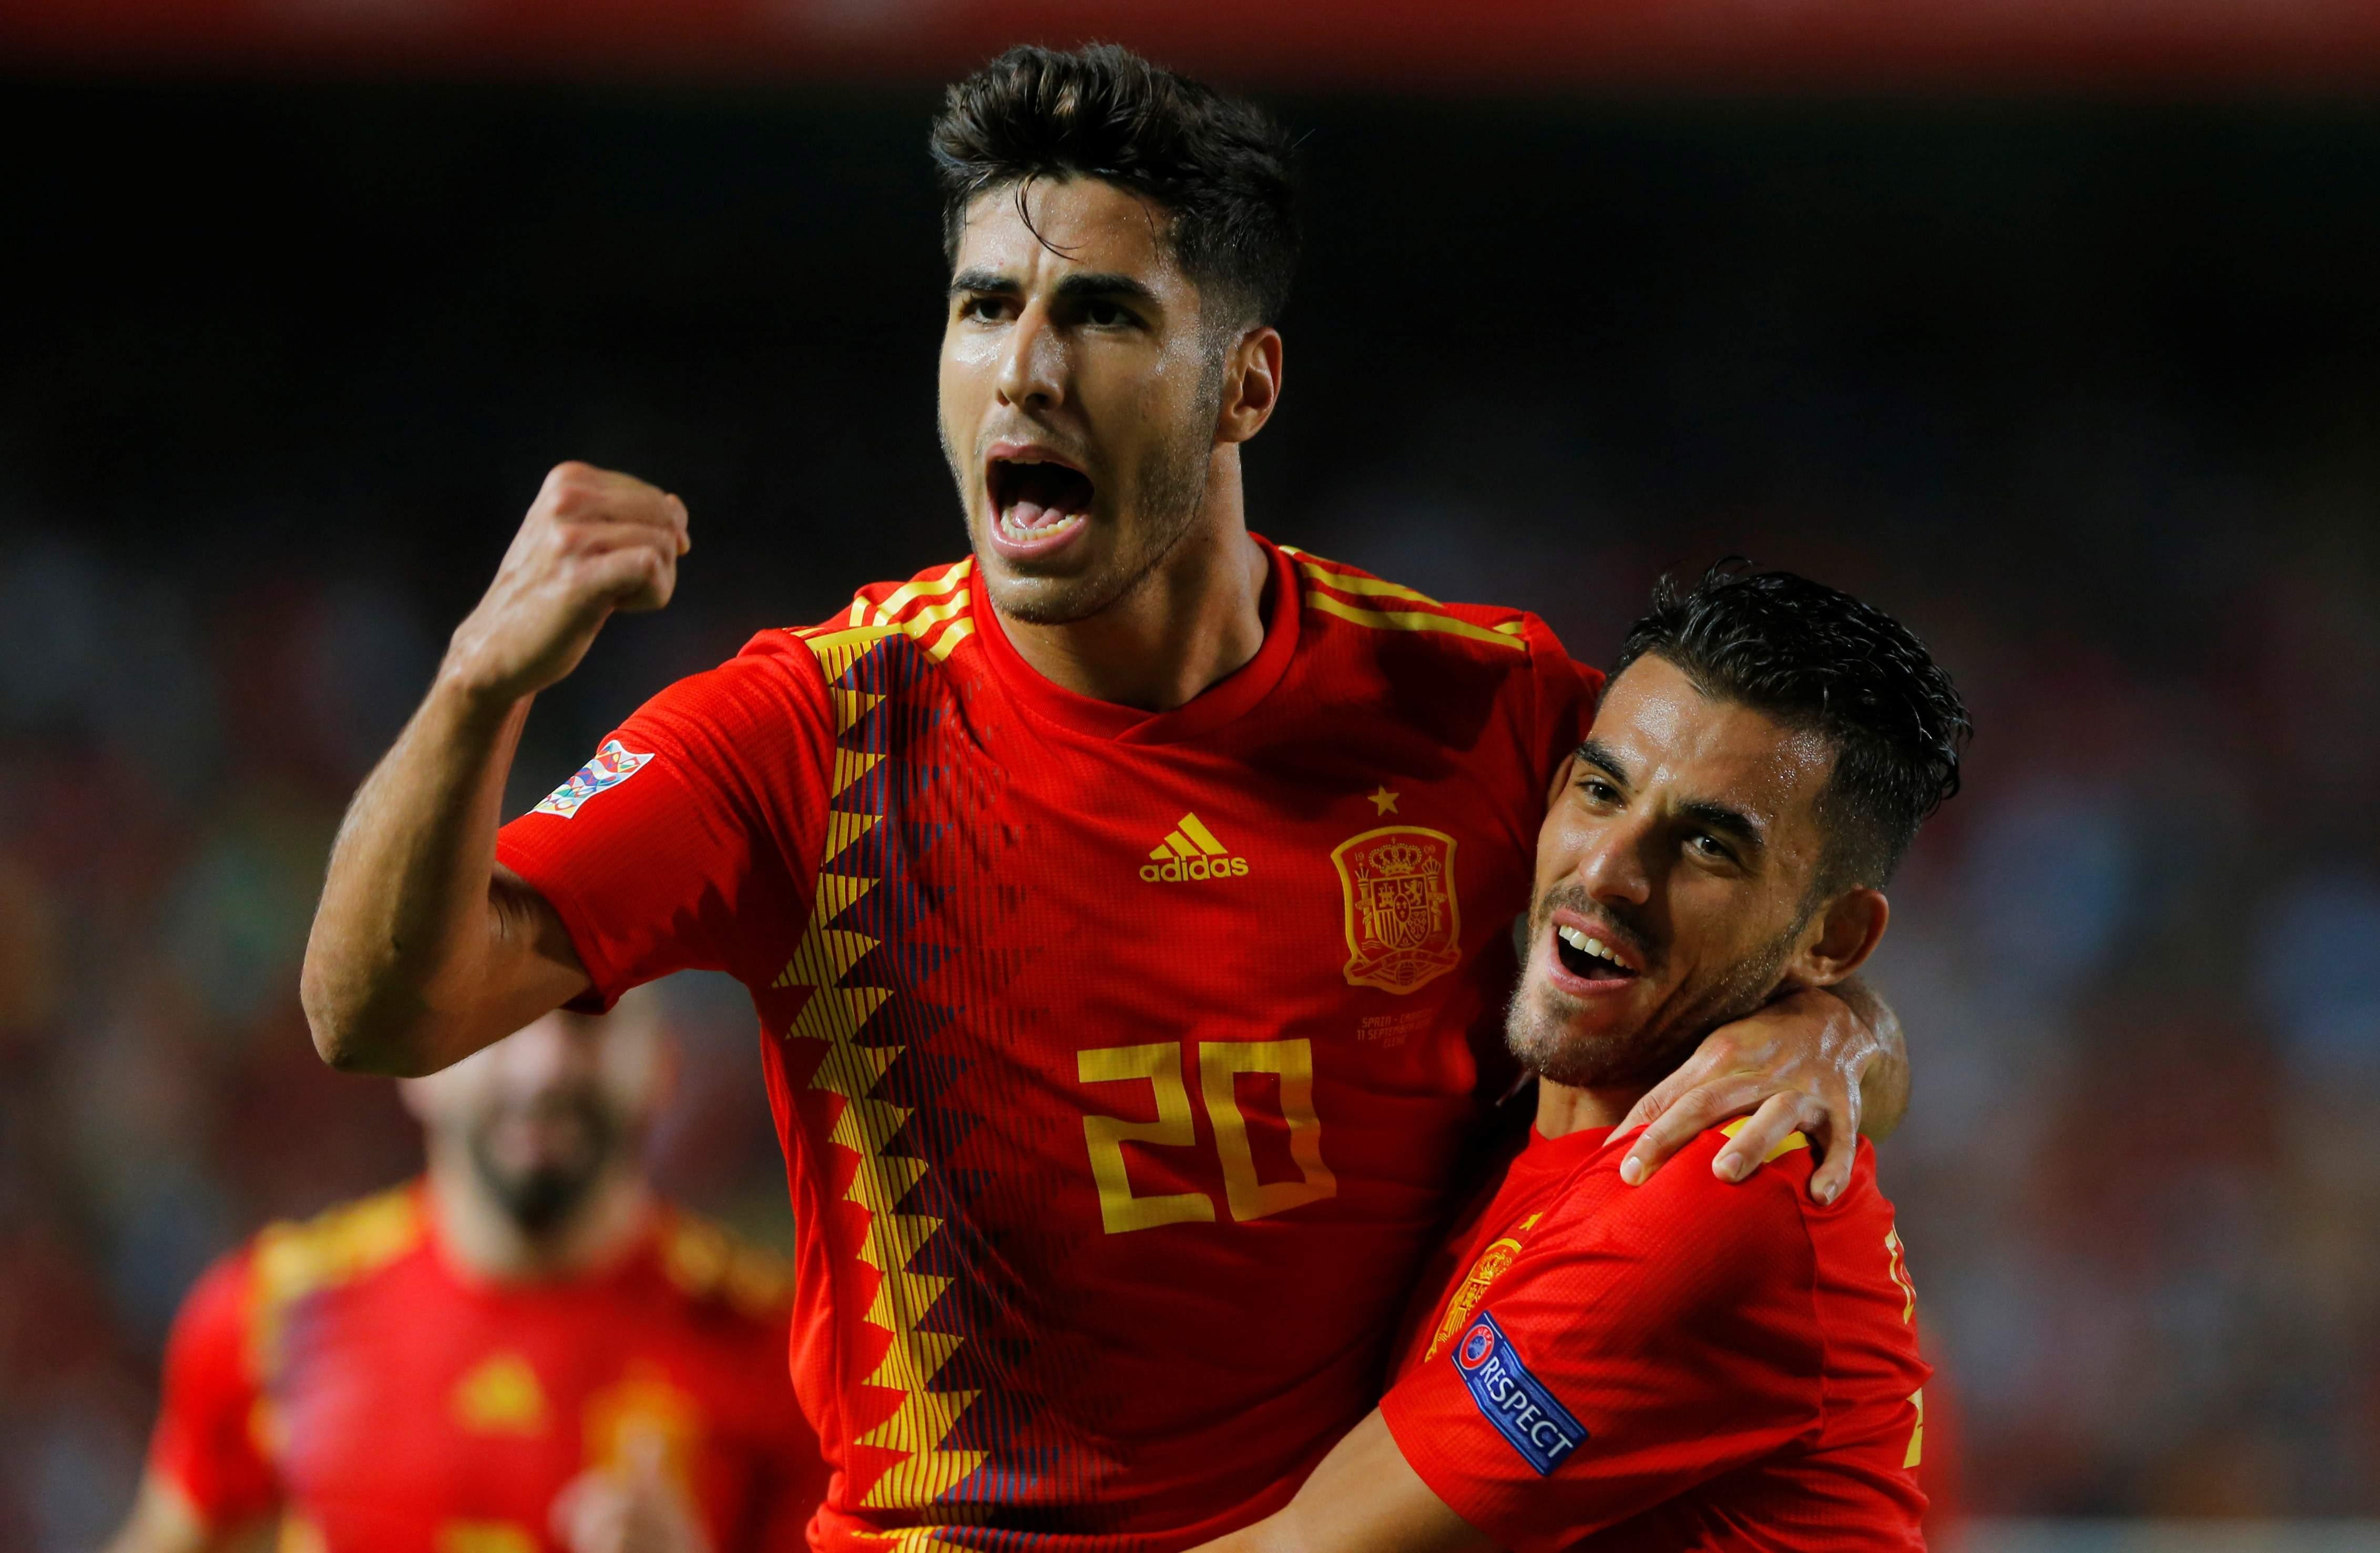 De-la-mano-de-Marco-Asensio-Espana-humilla-a-Croacia-Reuters.jpg